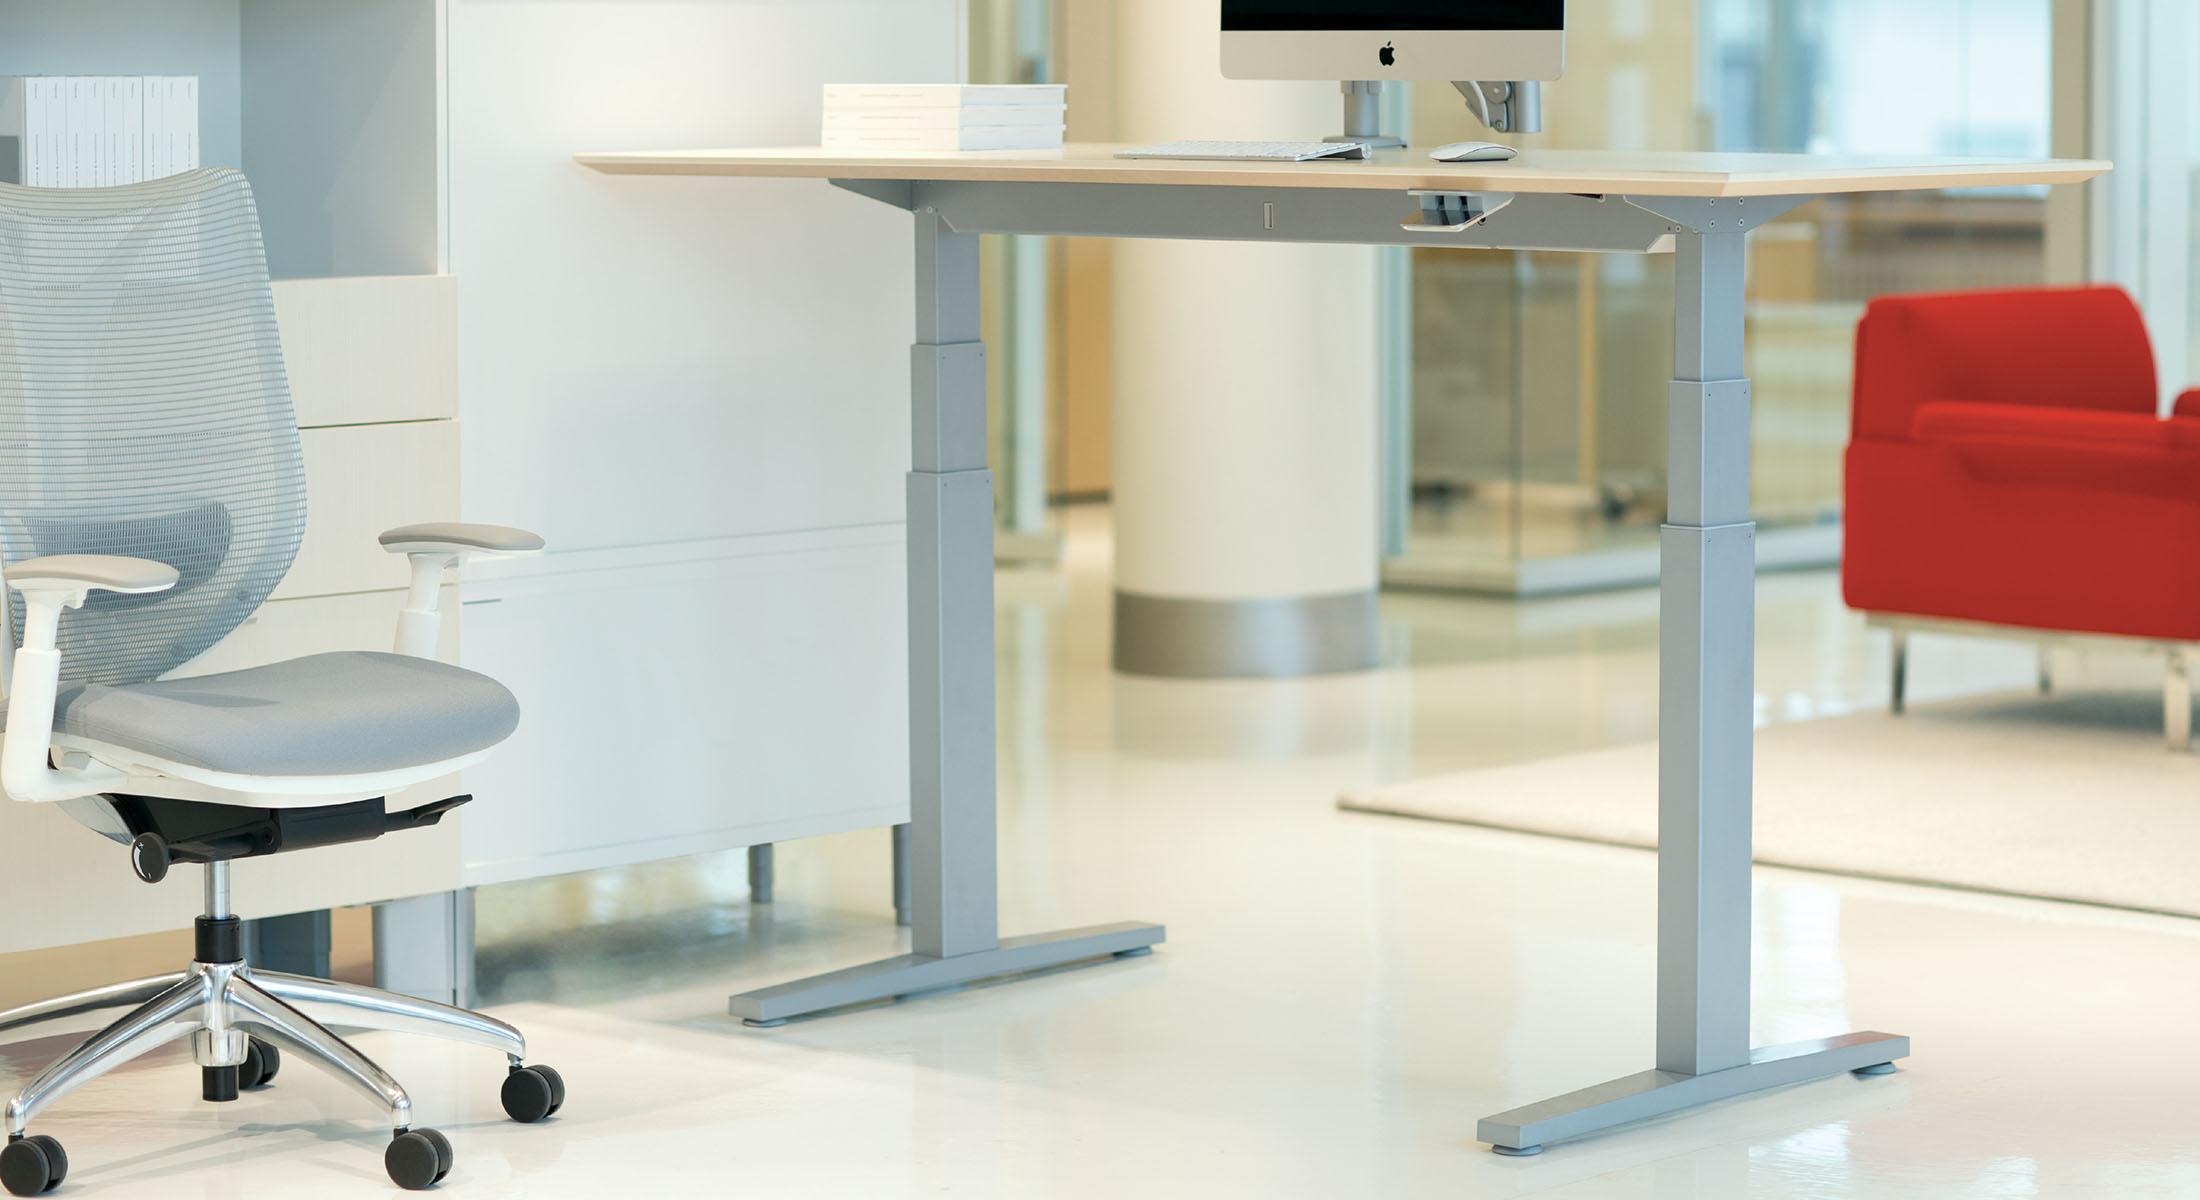 Livello Height Adjustable Tables Teknion Office Furniture - Height adjustable meeting table